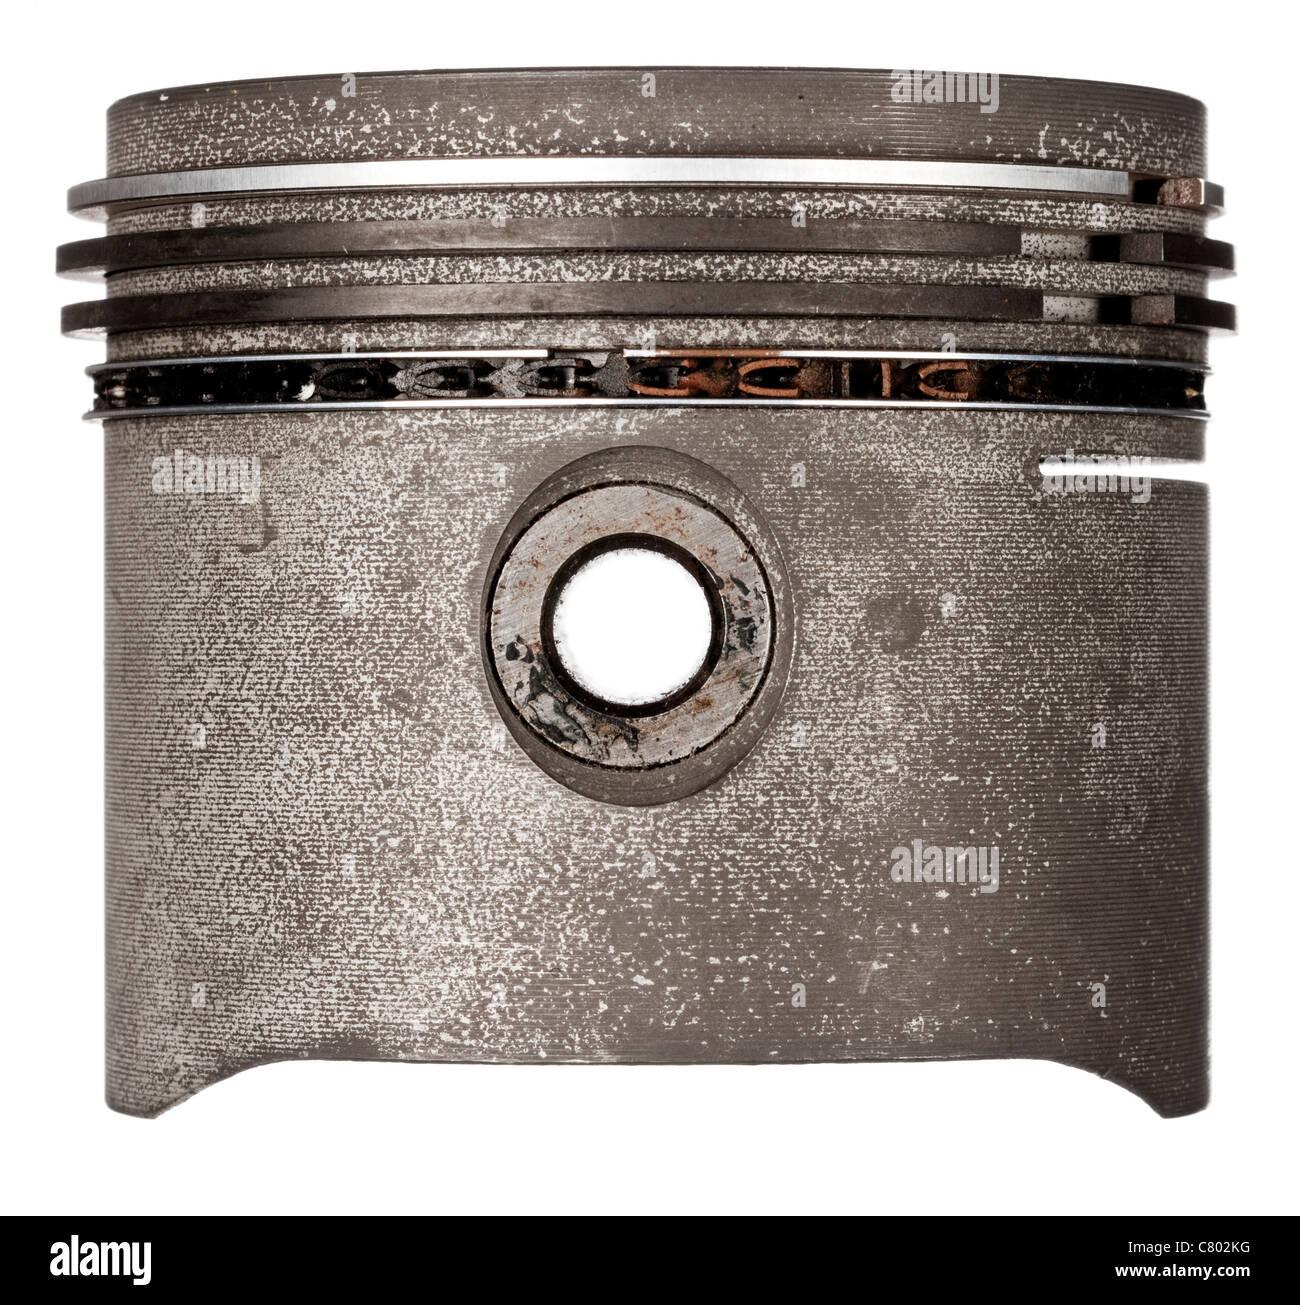 Car piston - Stock Image